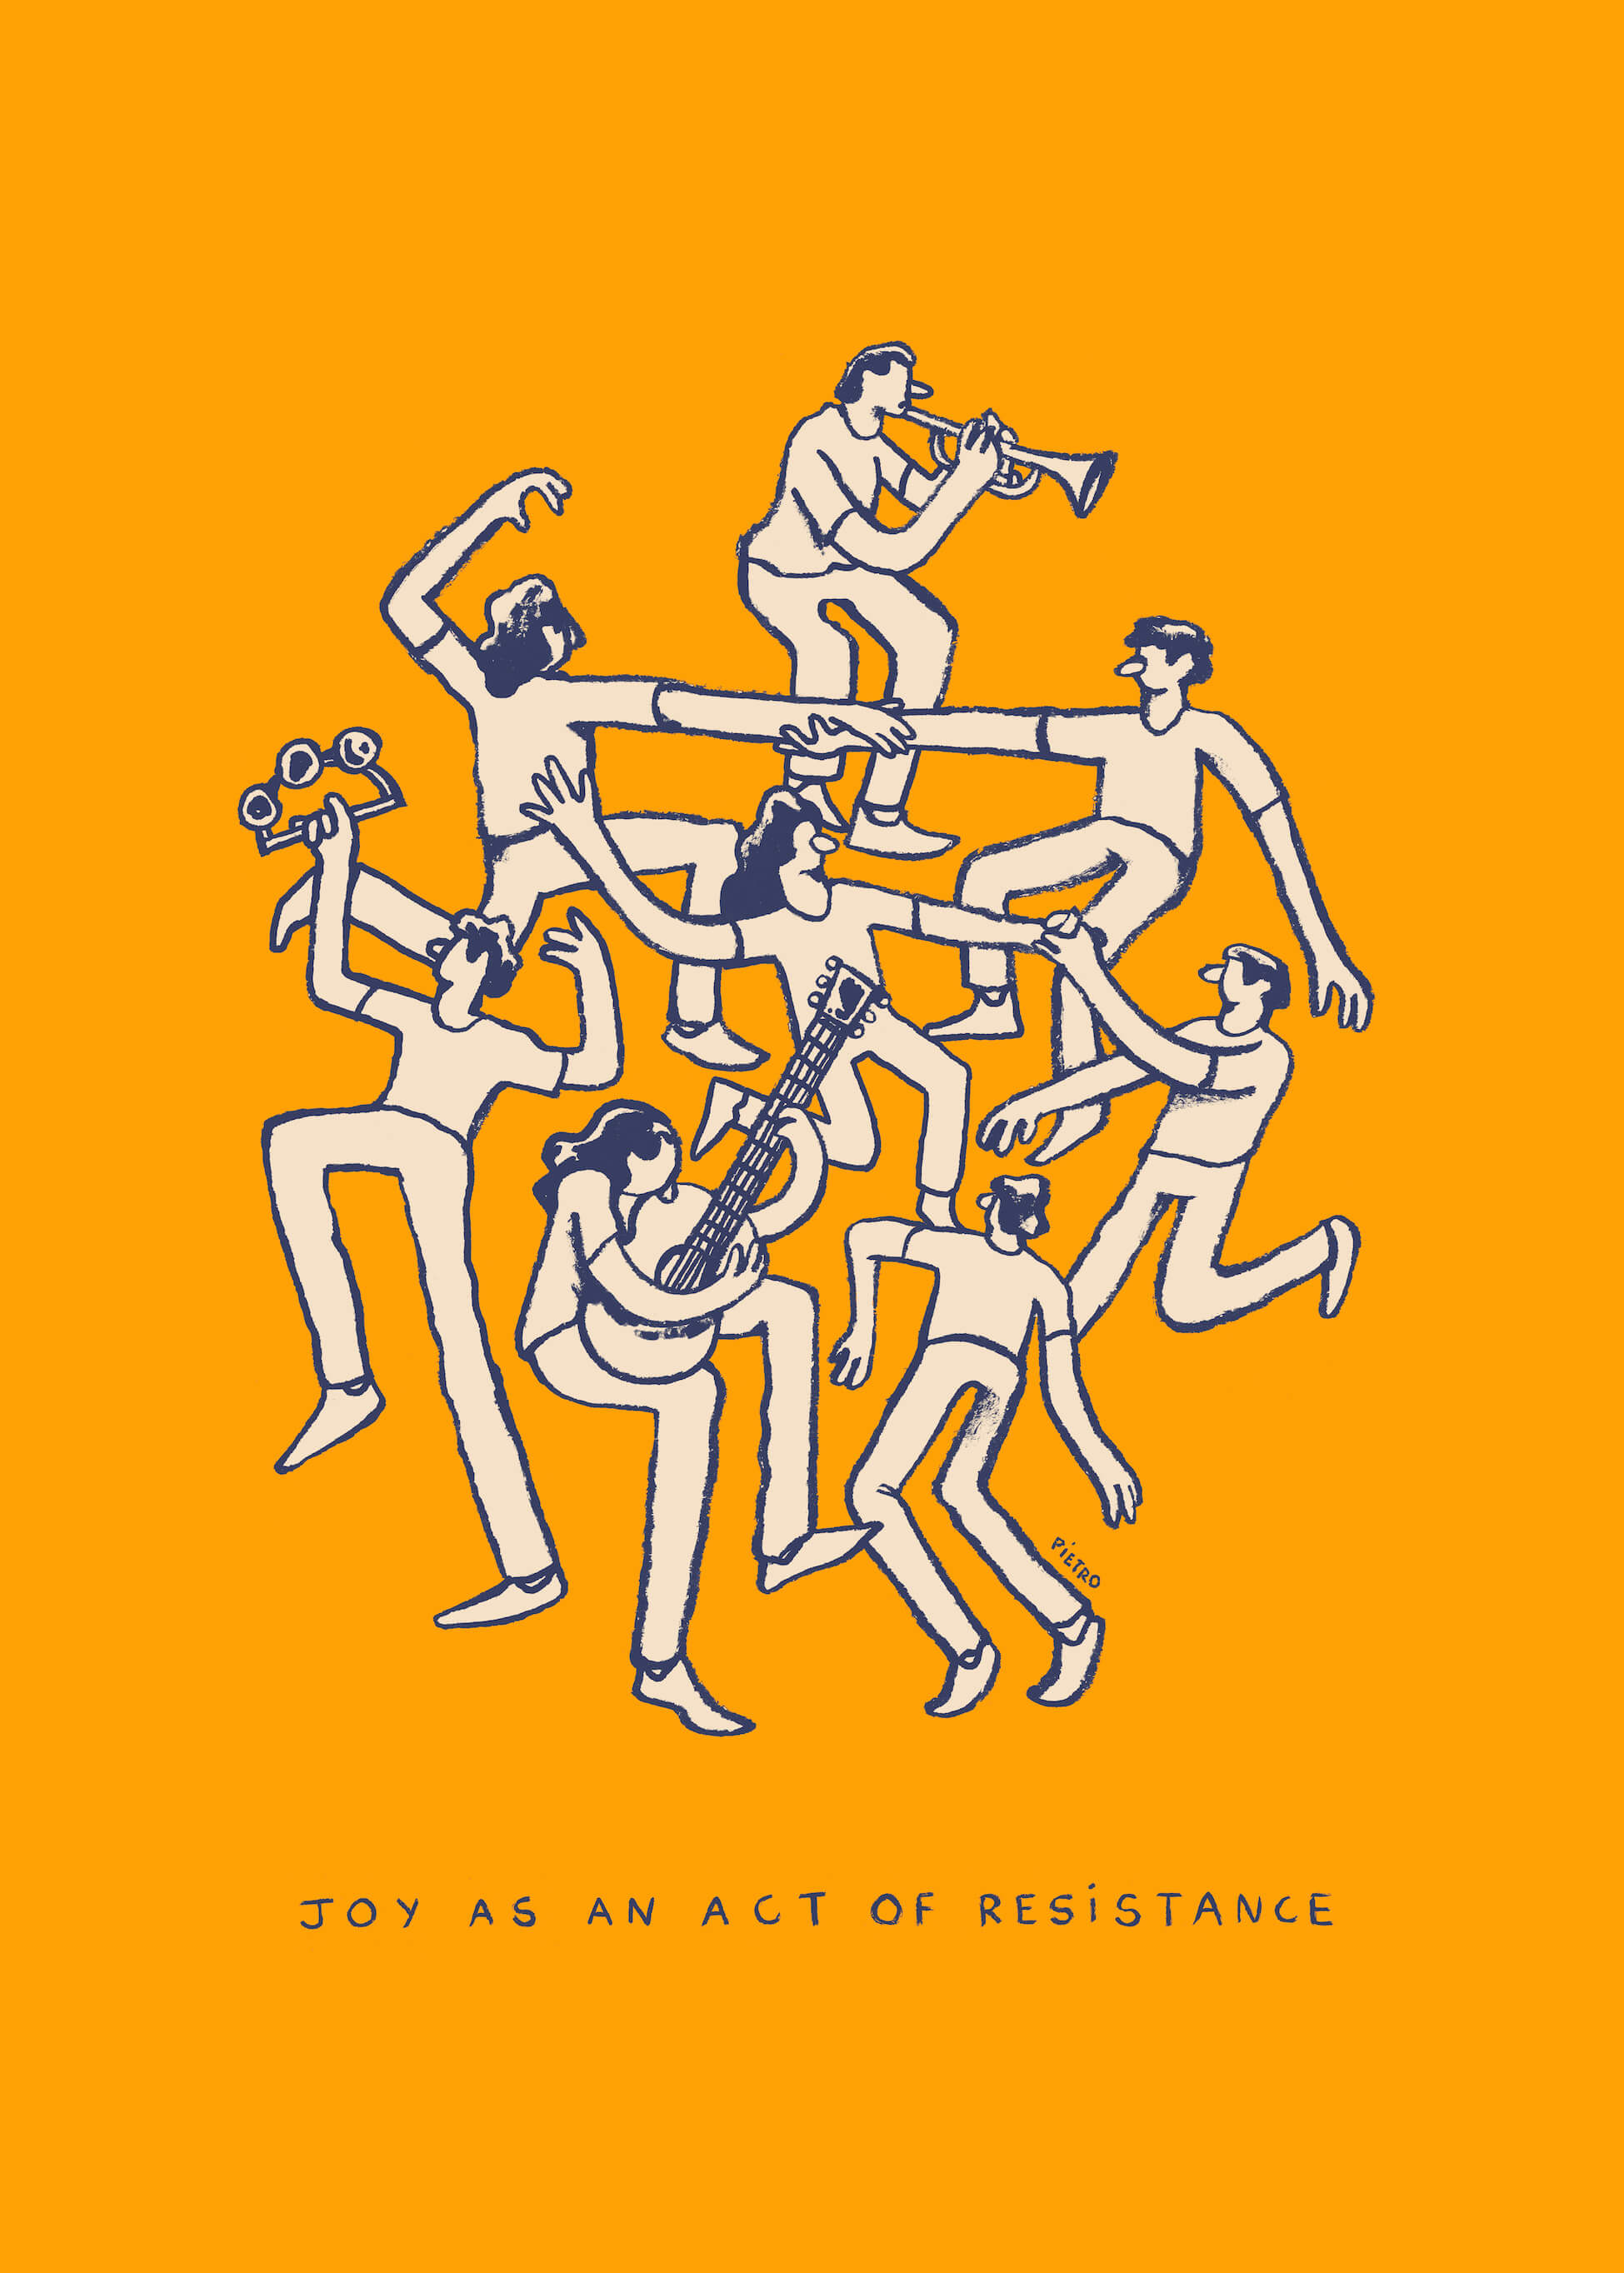 Joy As An Act Of Resistance main image